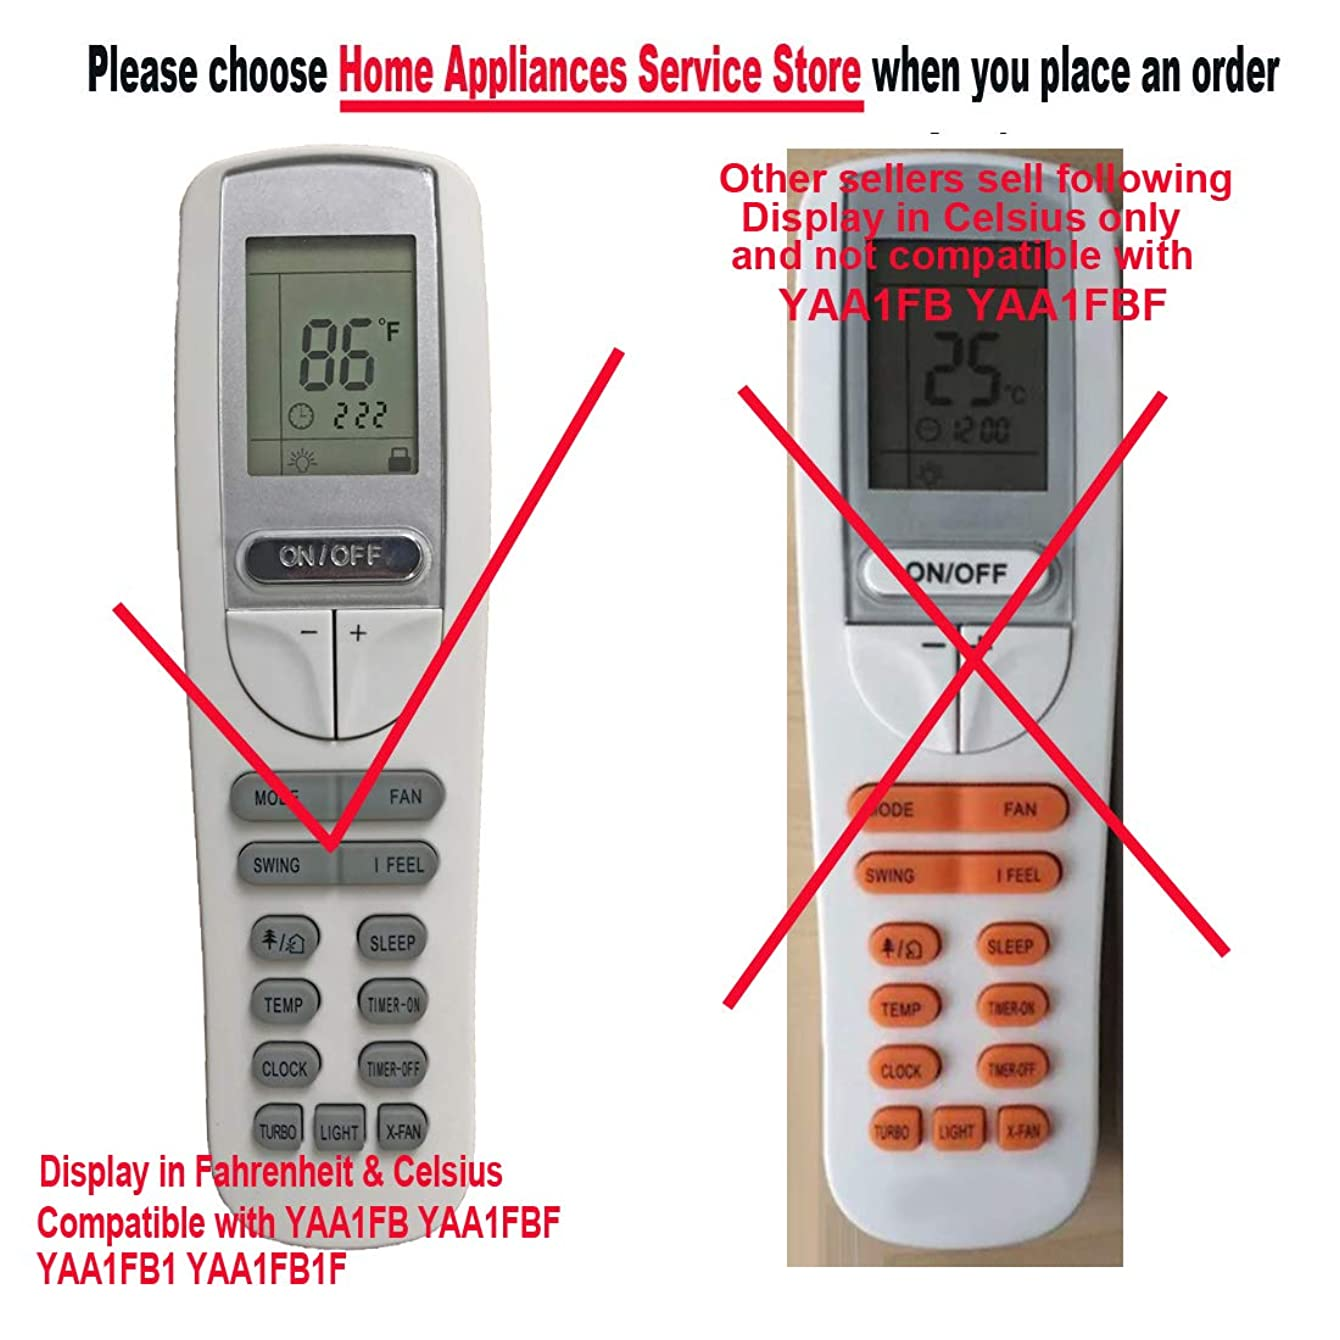 Replacment for GREE Air Conditioner Remote Control Model Number YAA1FB YAA1FBF YAA1FB1 YAA1FB1F